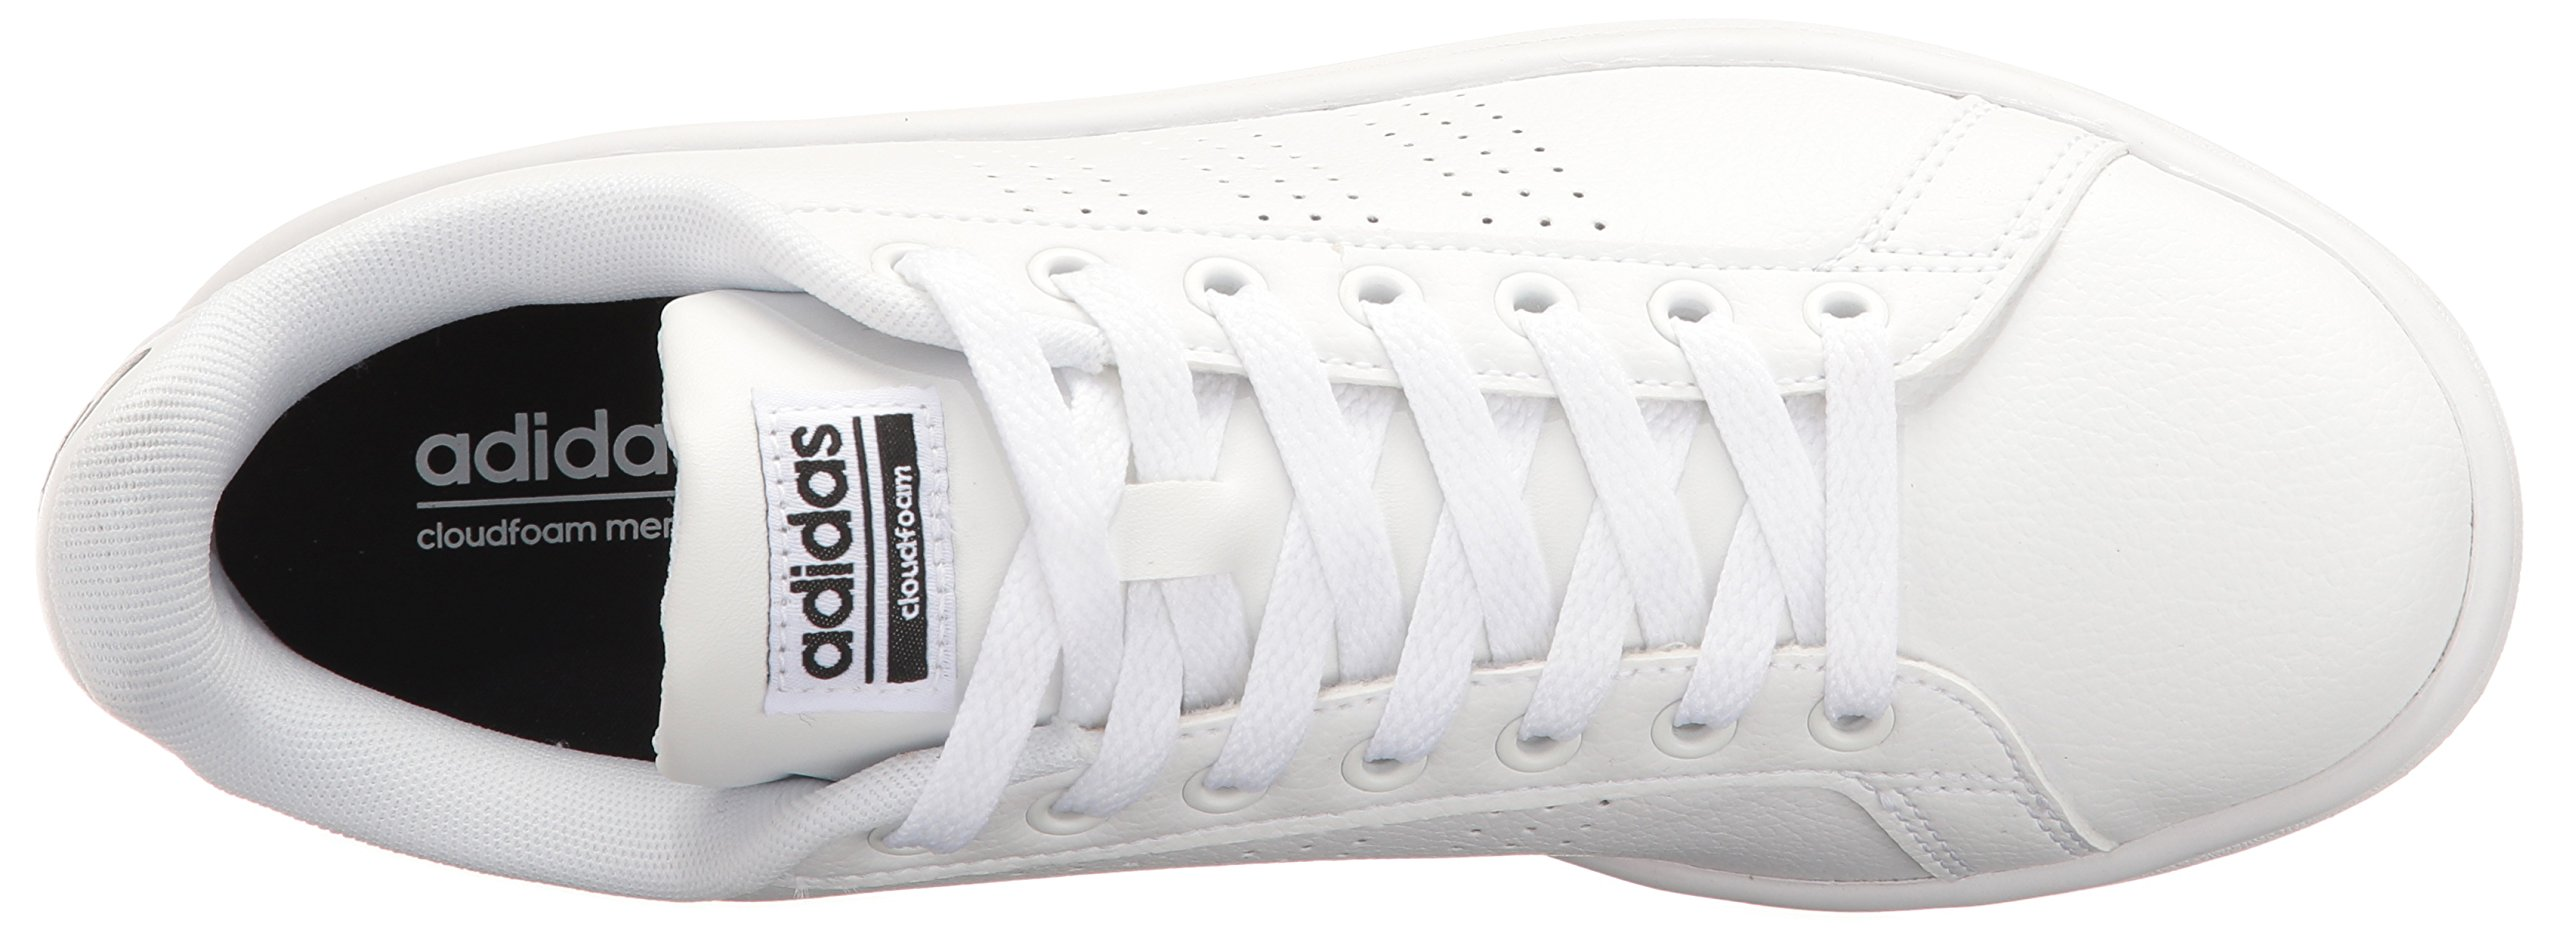 adidas Women's Shoes Cloudfoam Advantage Clean Sneakers, White/White/Black, (7.5 M US) by adidas (Image #8)